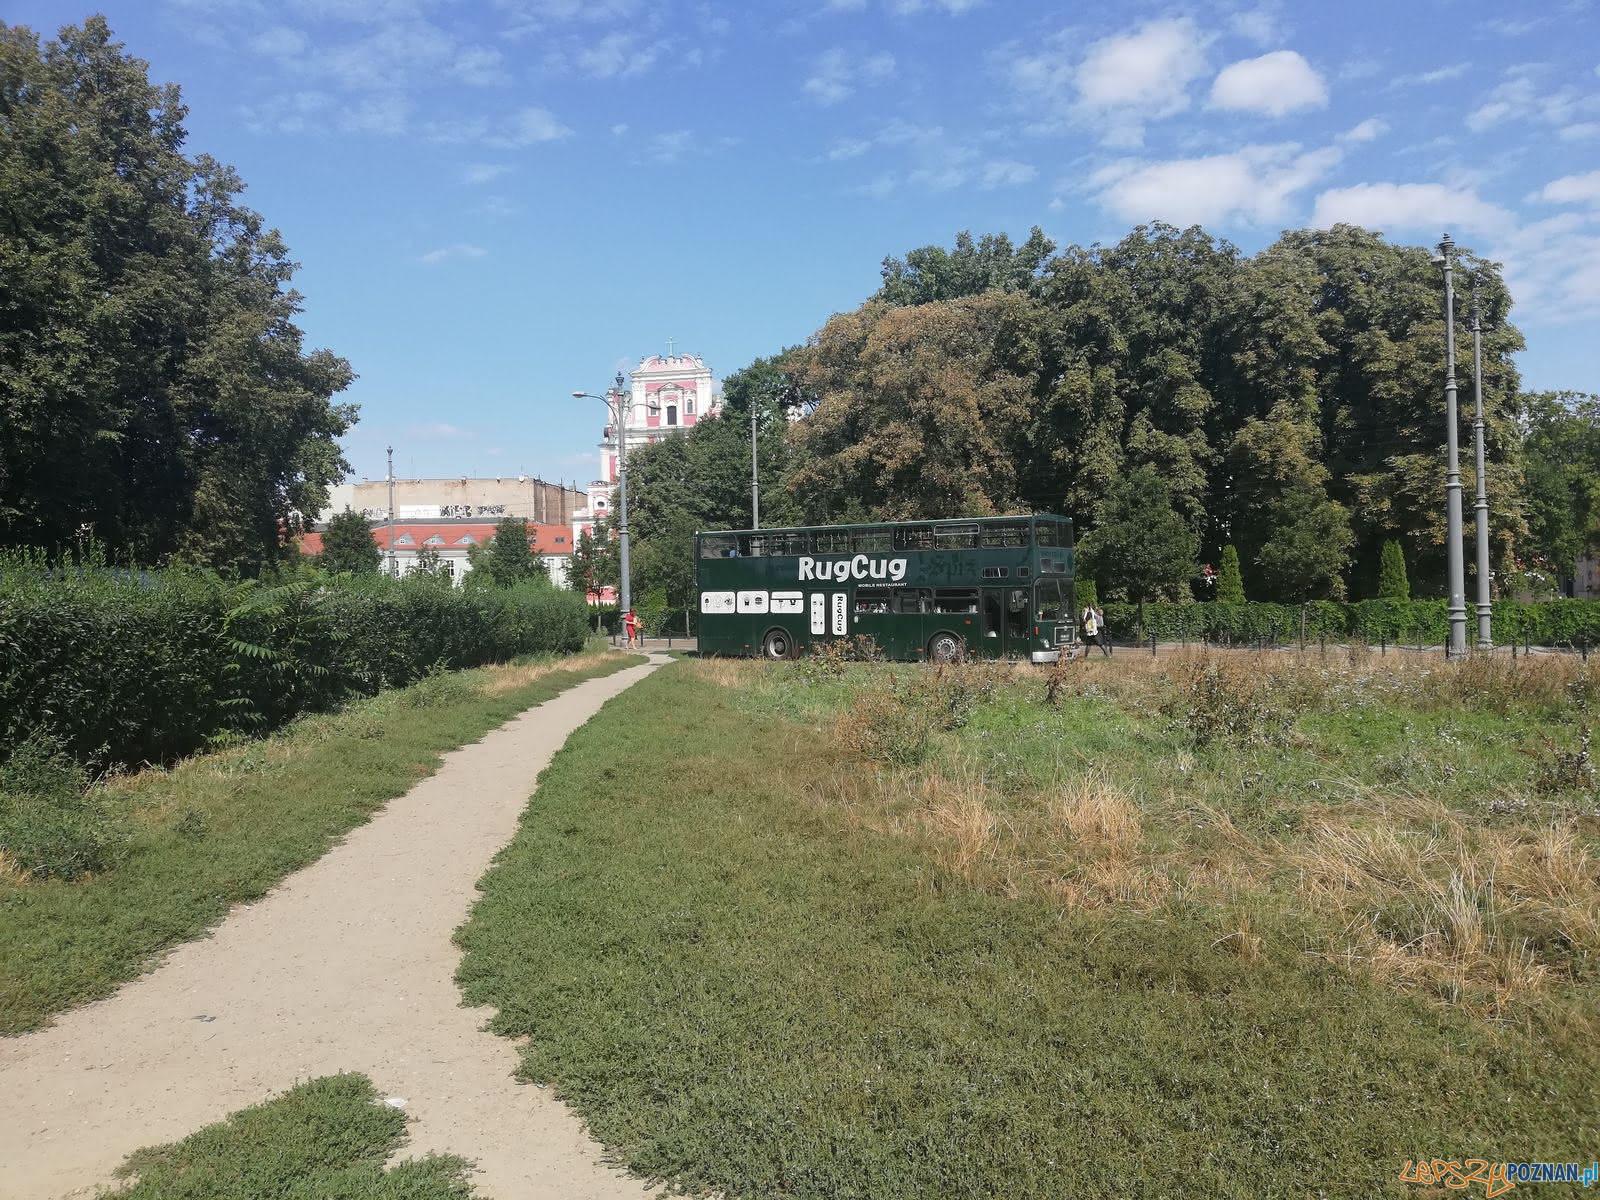 Podgórna - Zielona  Foto: T. Dworek